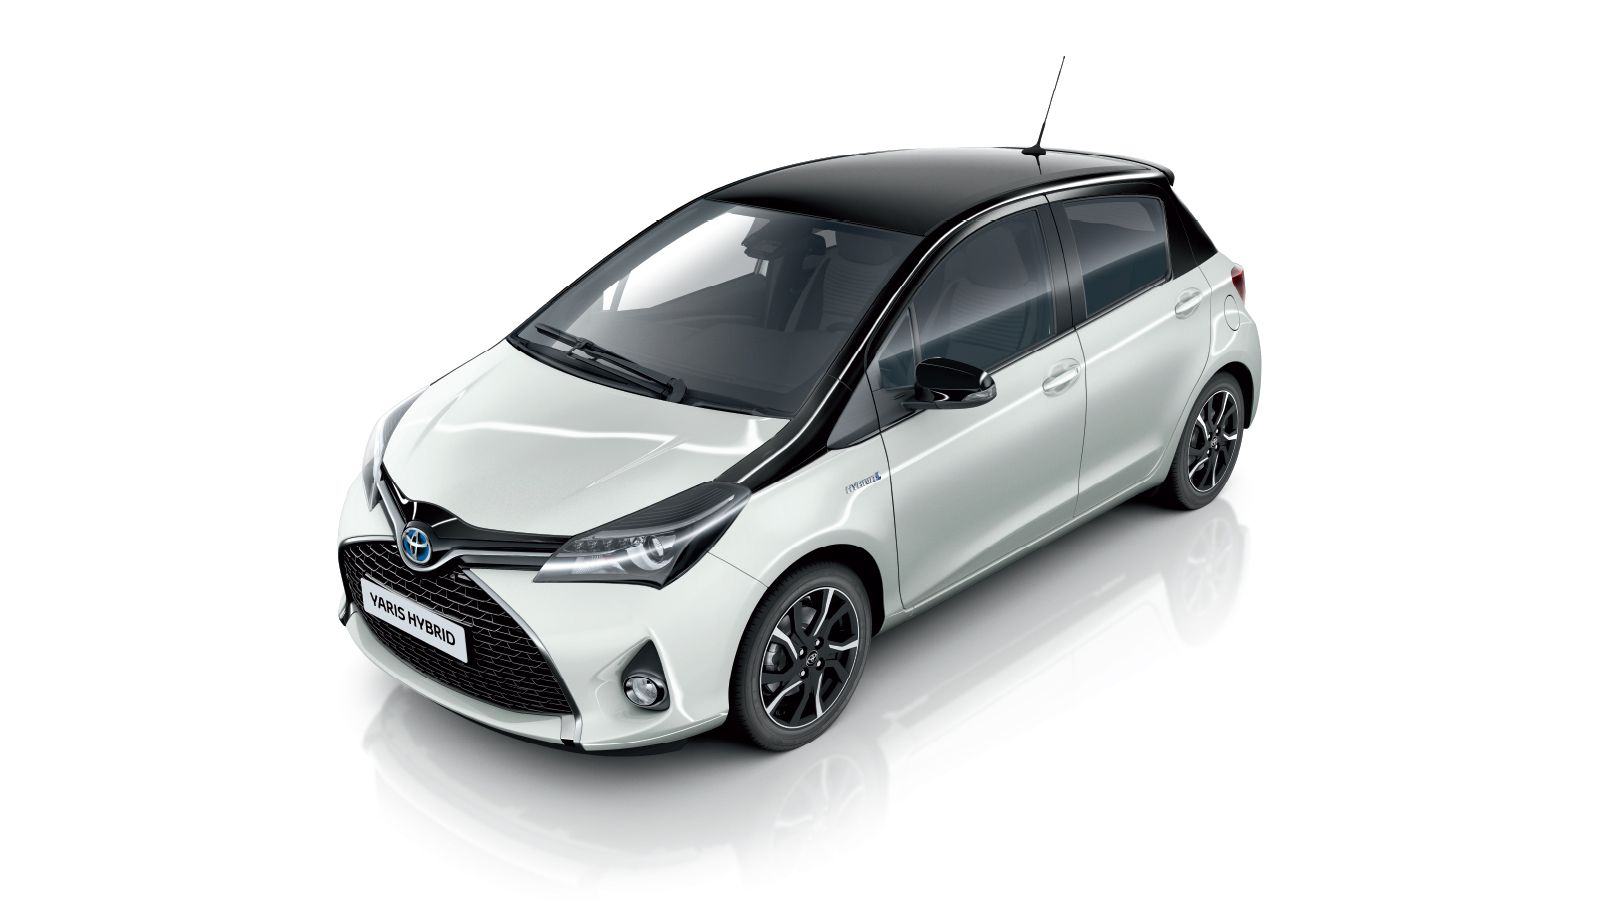 Yaris Hybrid Diesel Cars Toyota Uk Luxury Hybrid Cars Yaris Toyota